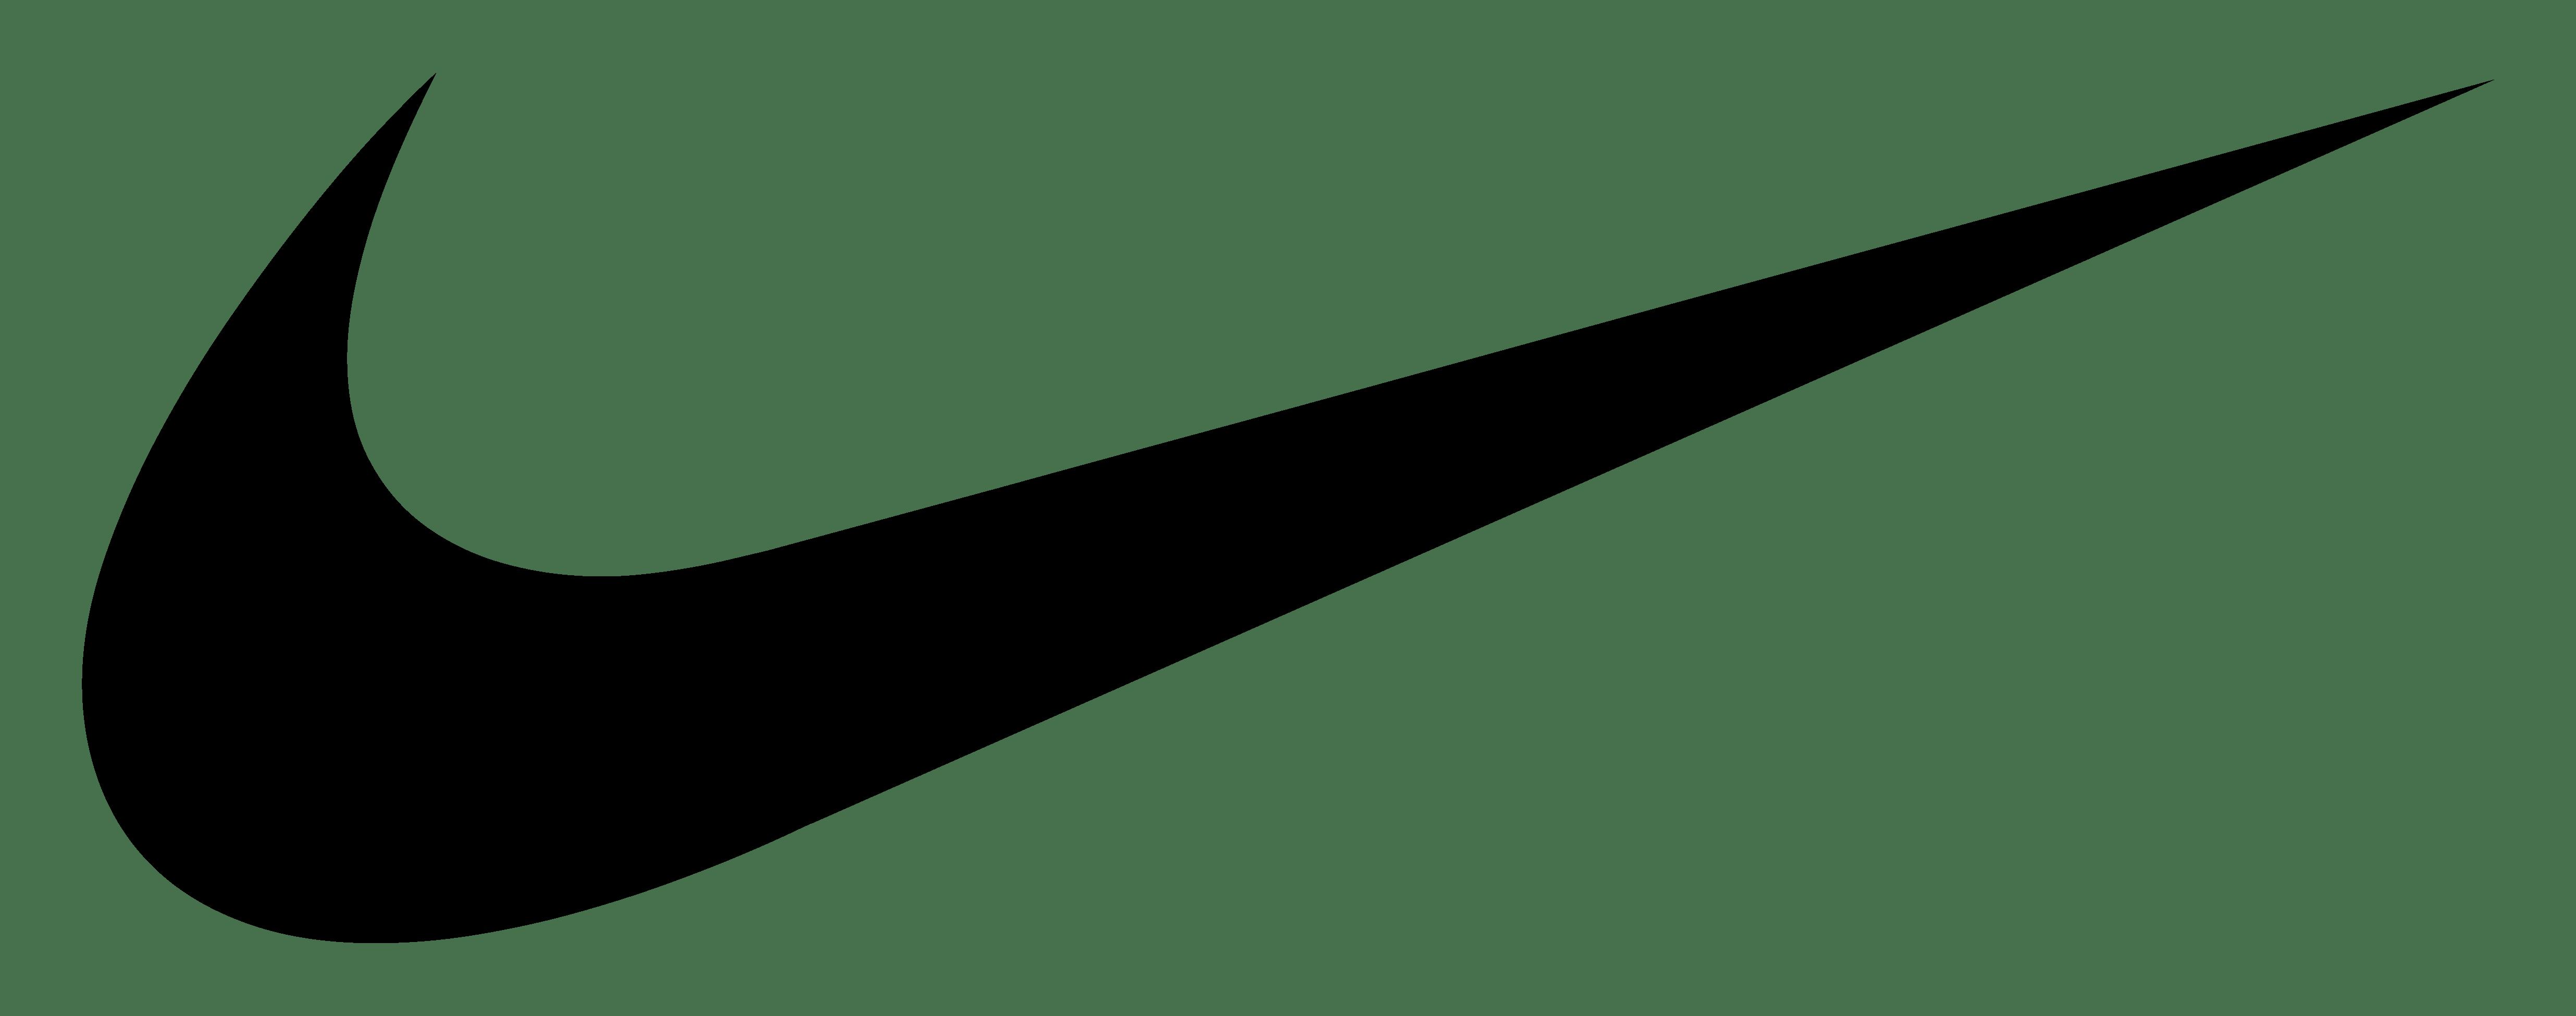 Nike Logo Png Shoes Brand